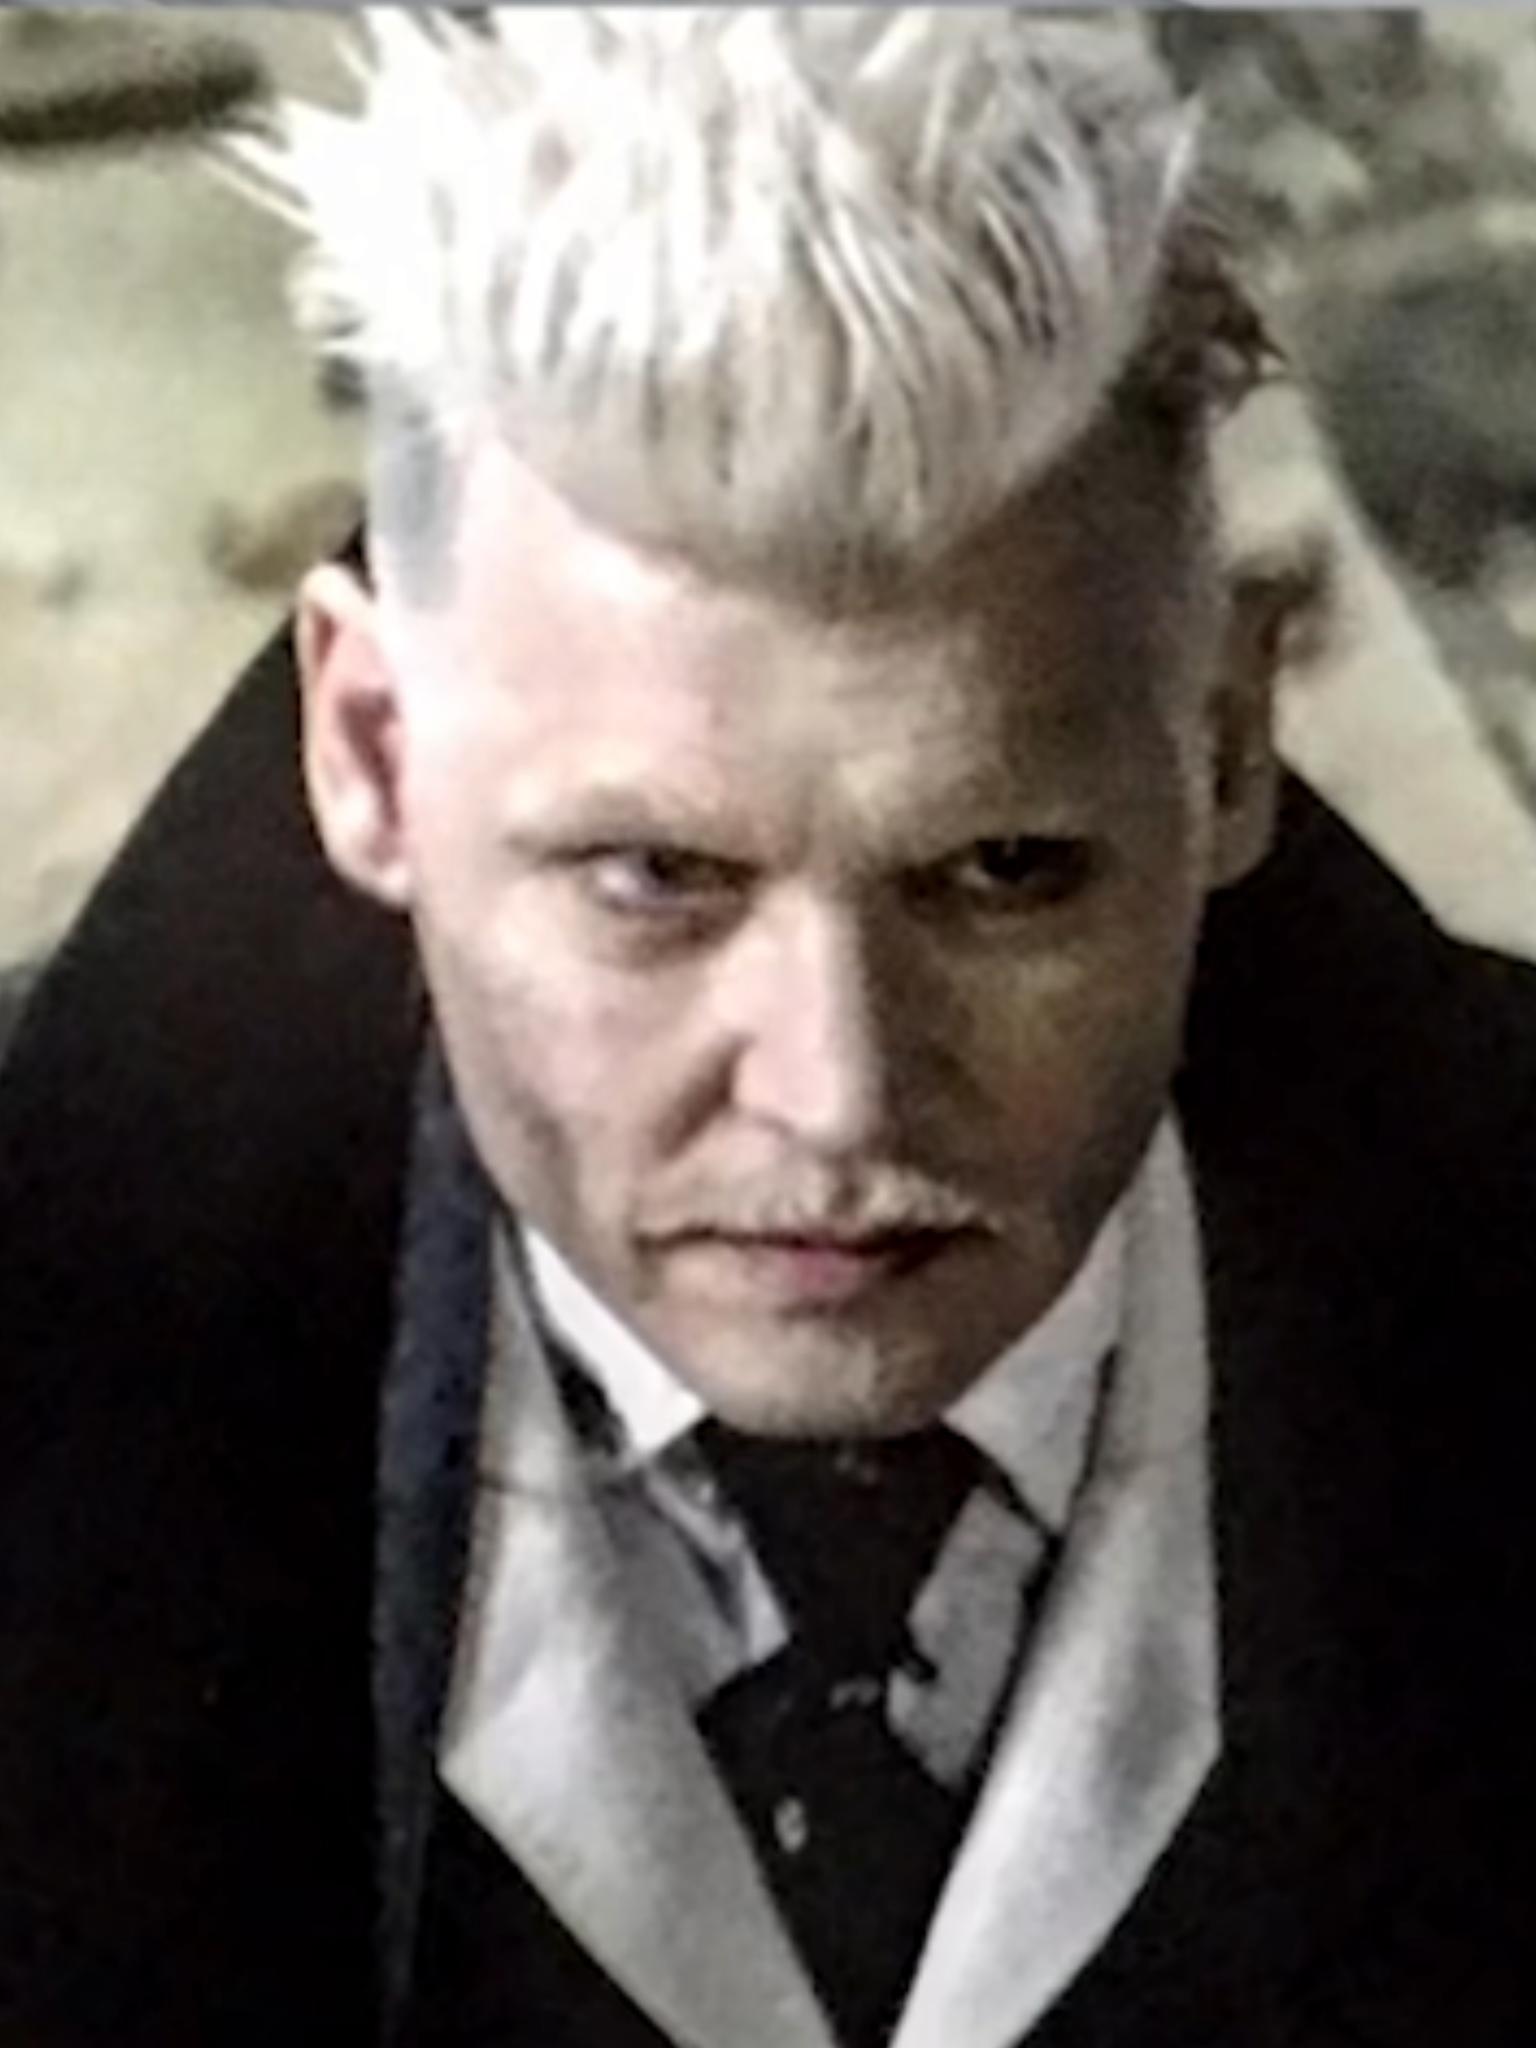 Johnny Depp As Gellert Grindelwald Harry Potter Fantastic Beasts Fantastic Beasts Fantastic Beasts And Where